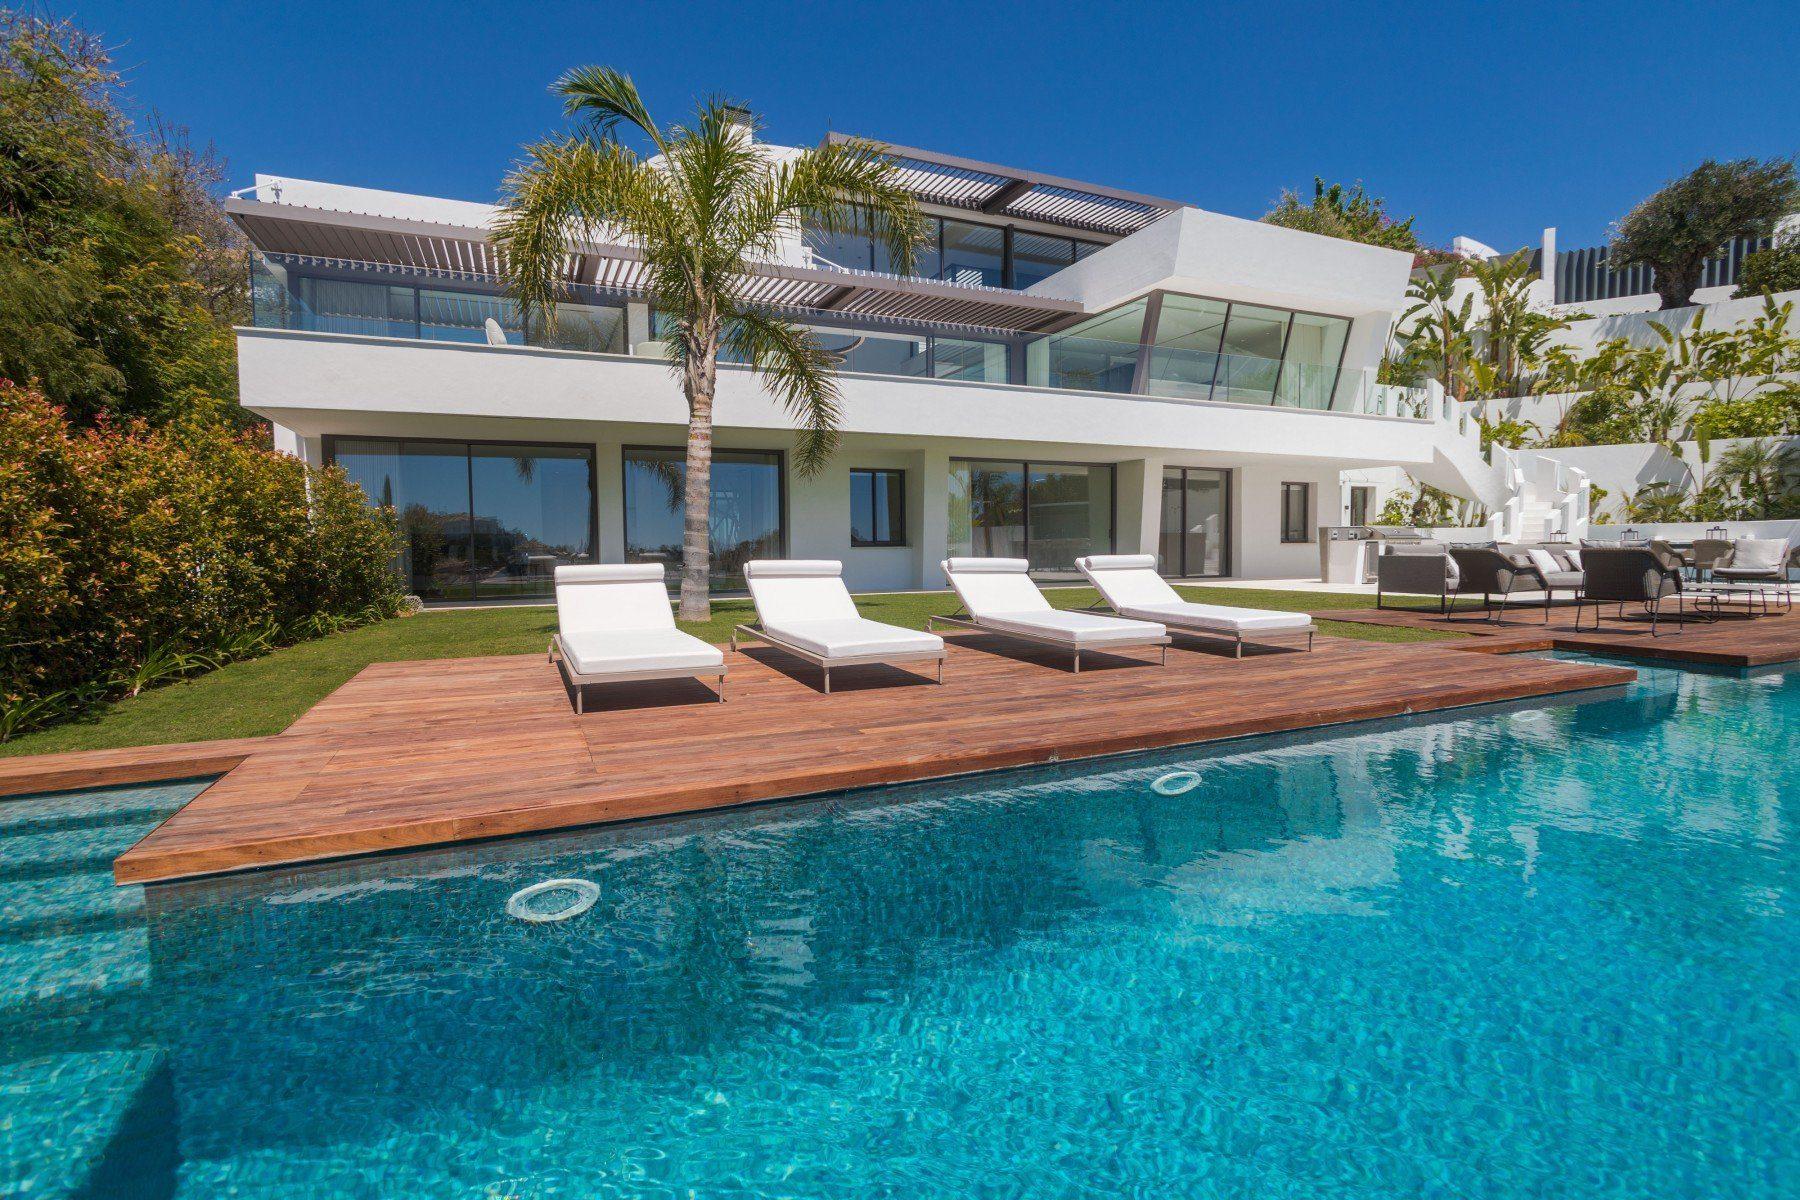 New Luxury Villa With Panoramic Sea Views In La Quinta, Benahavis